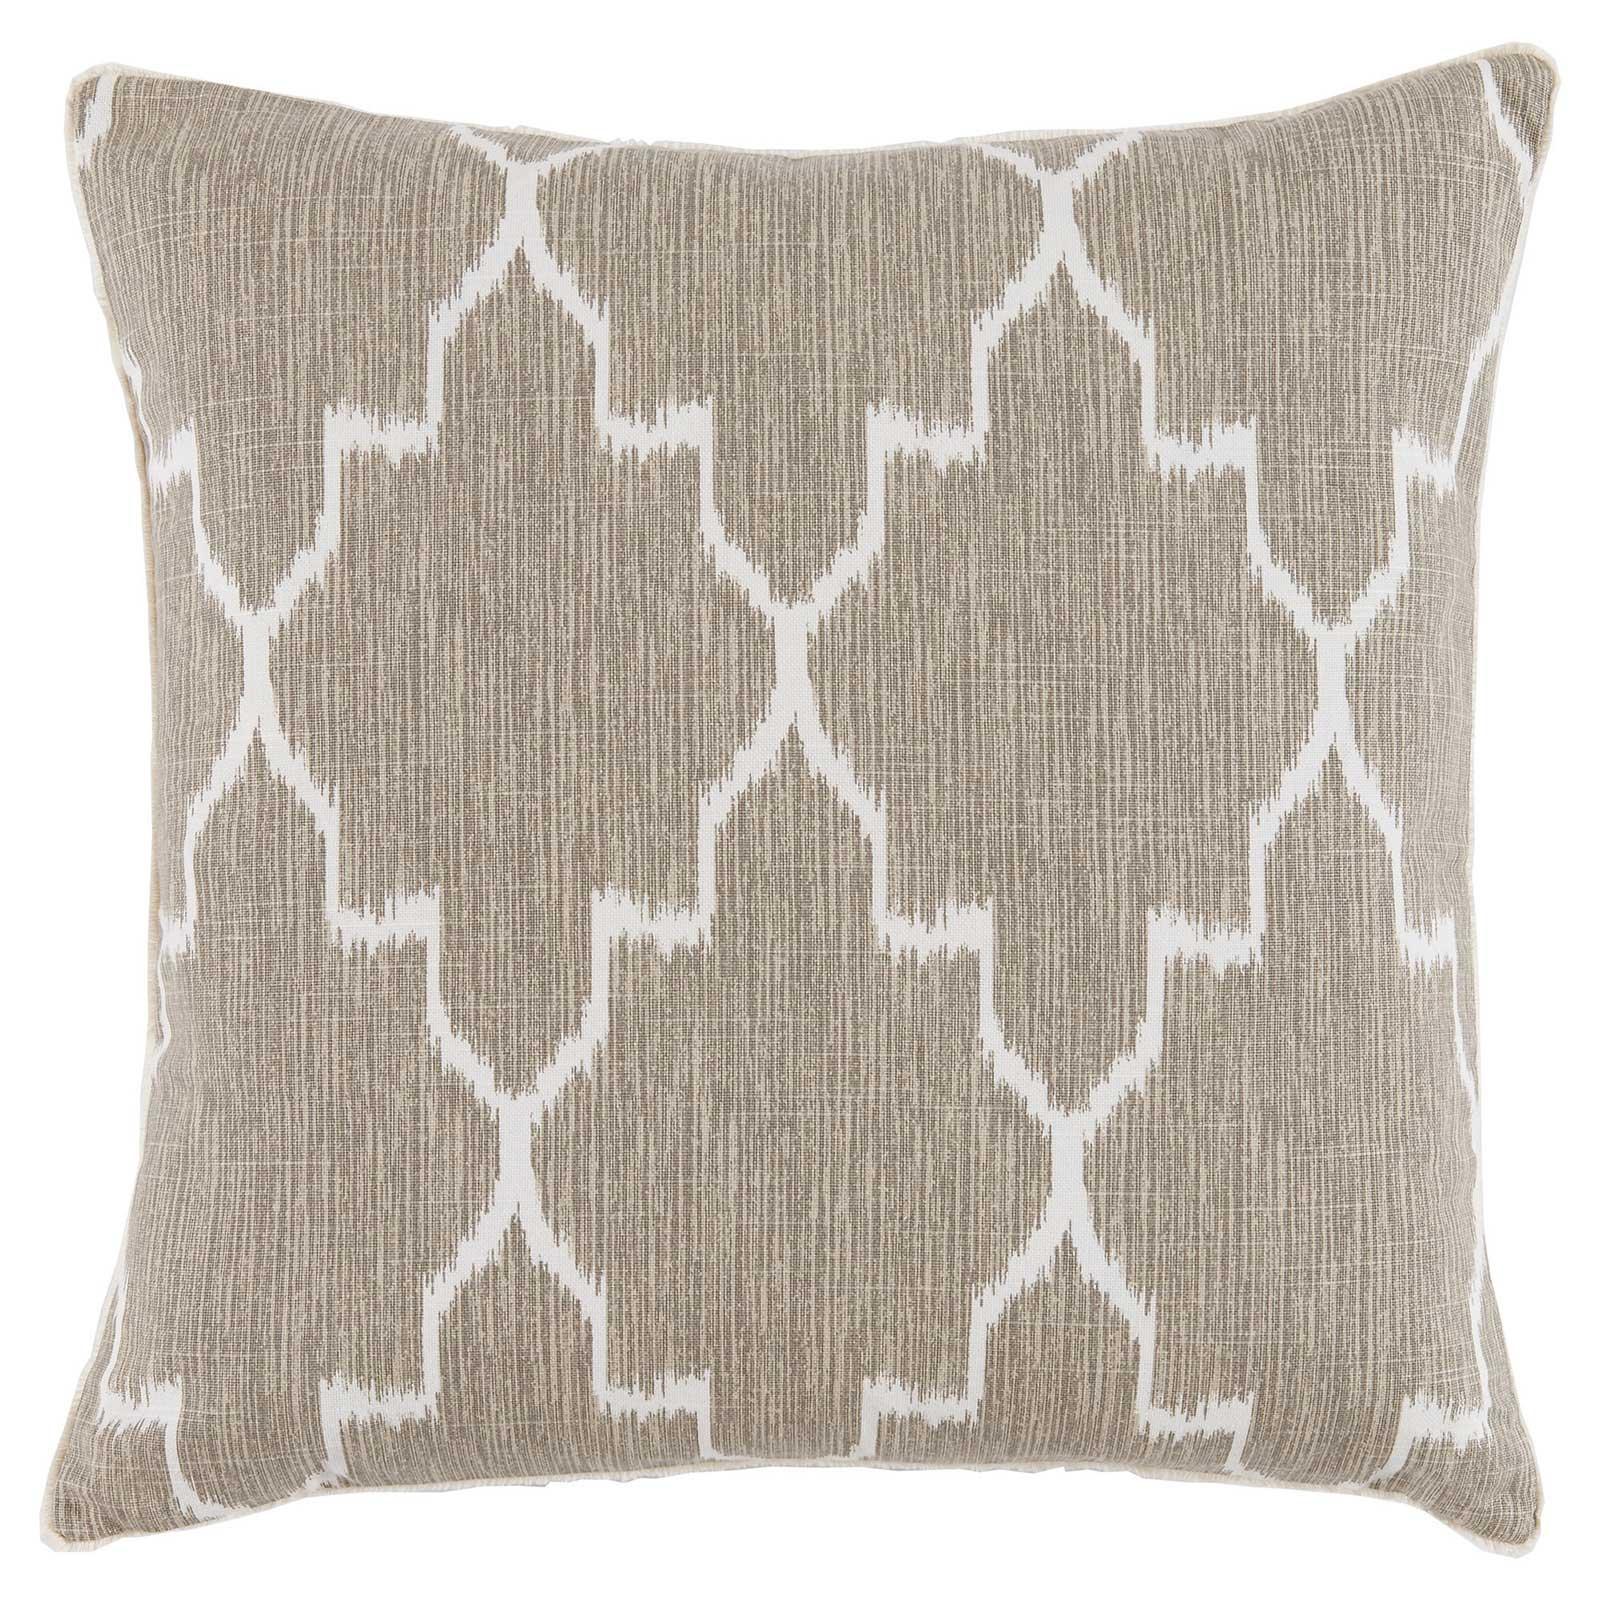 Avi Global Bazaar Ivory Fret Beige Linen Pillow - 20x20